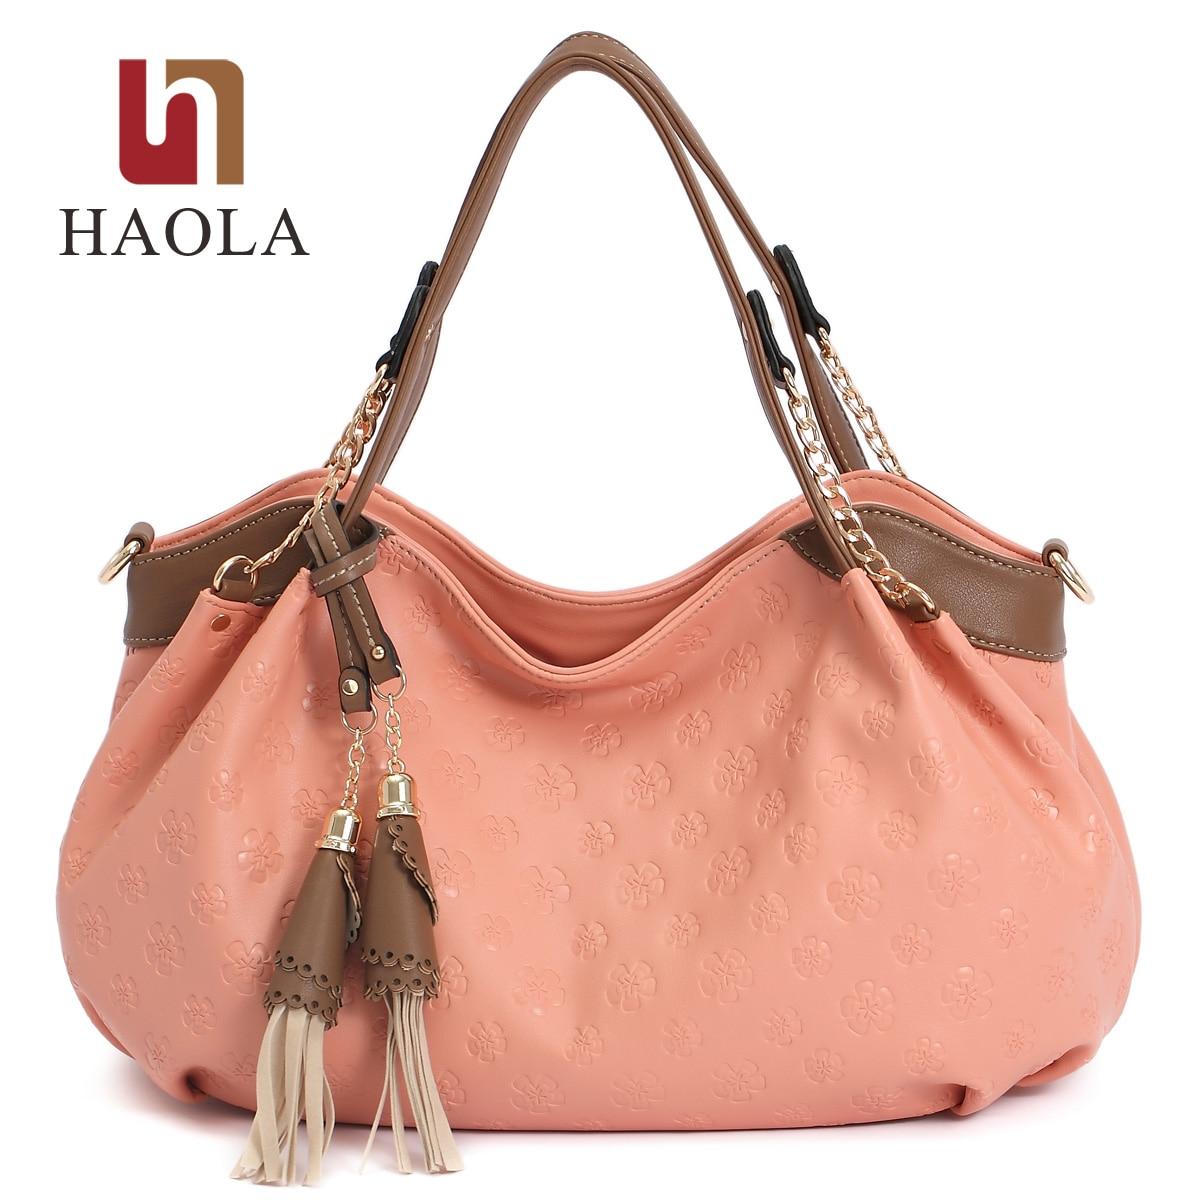 Women's bags women's handbag the trend of fashion one shoulder cross-body nxafdfnn